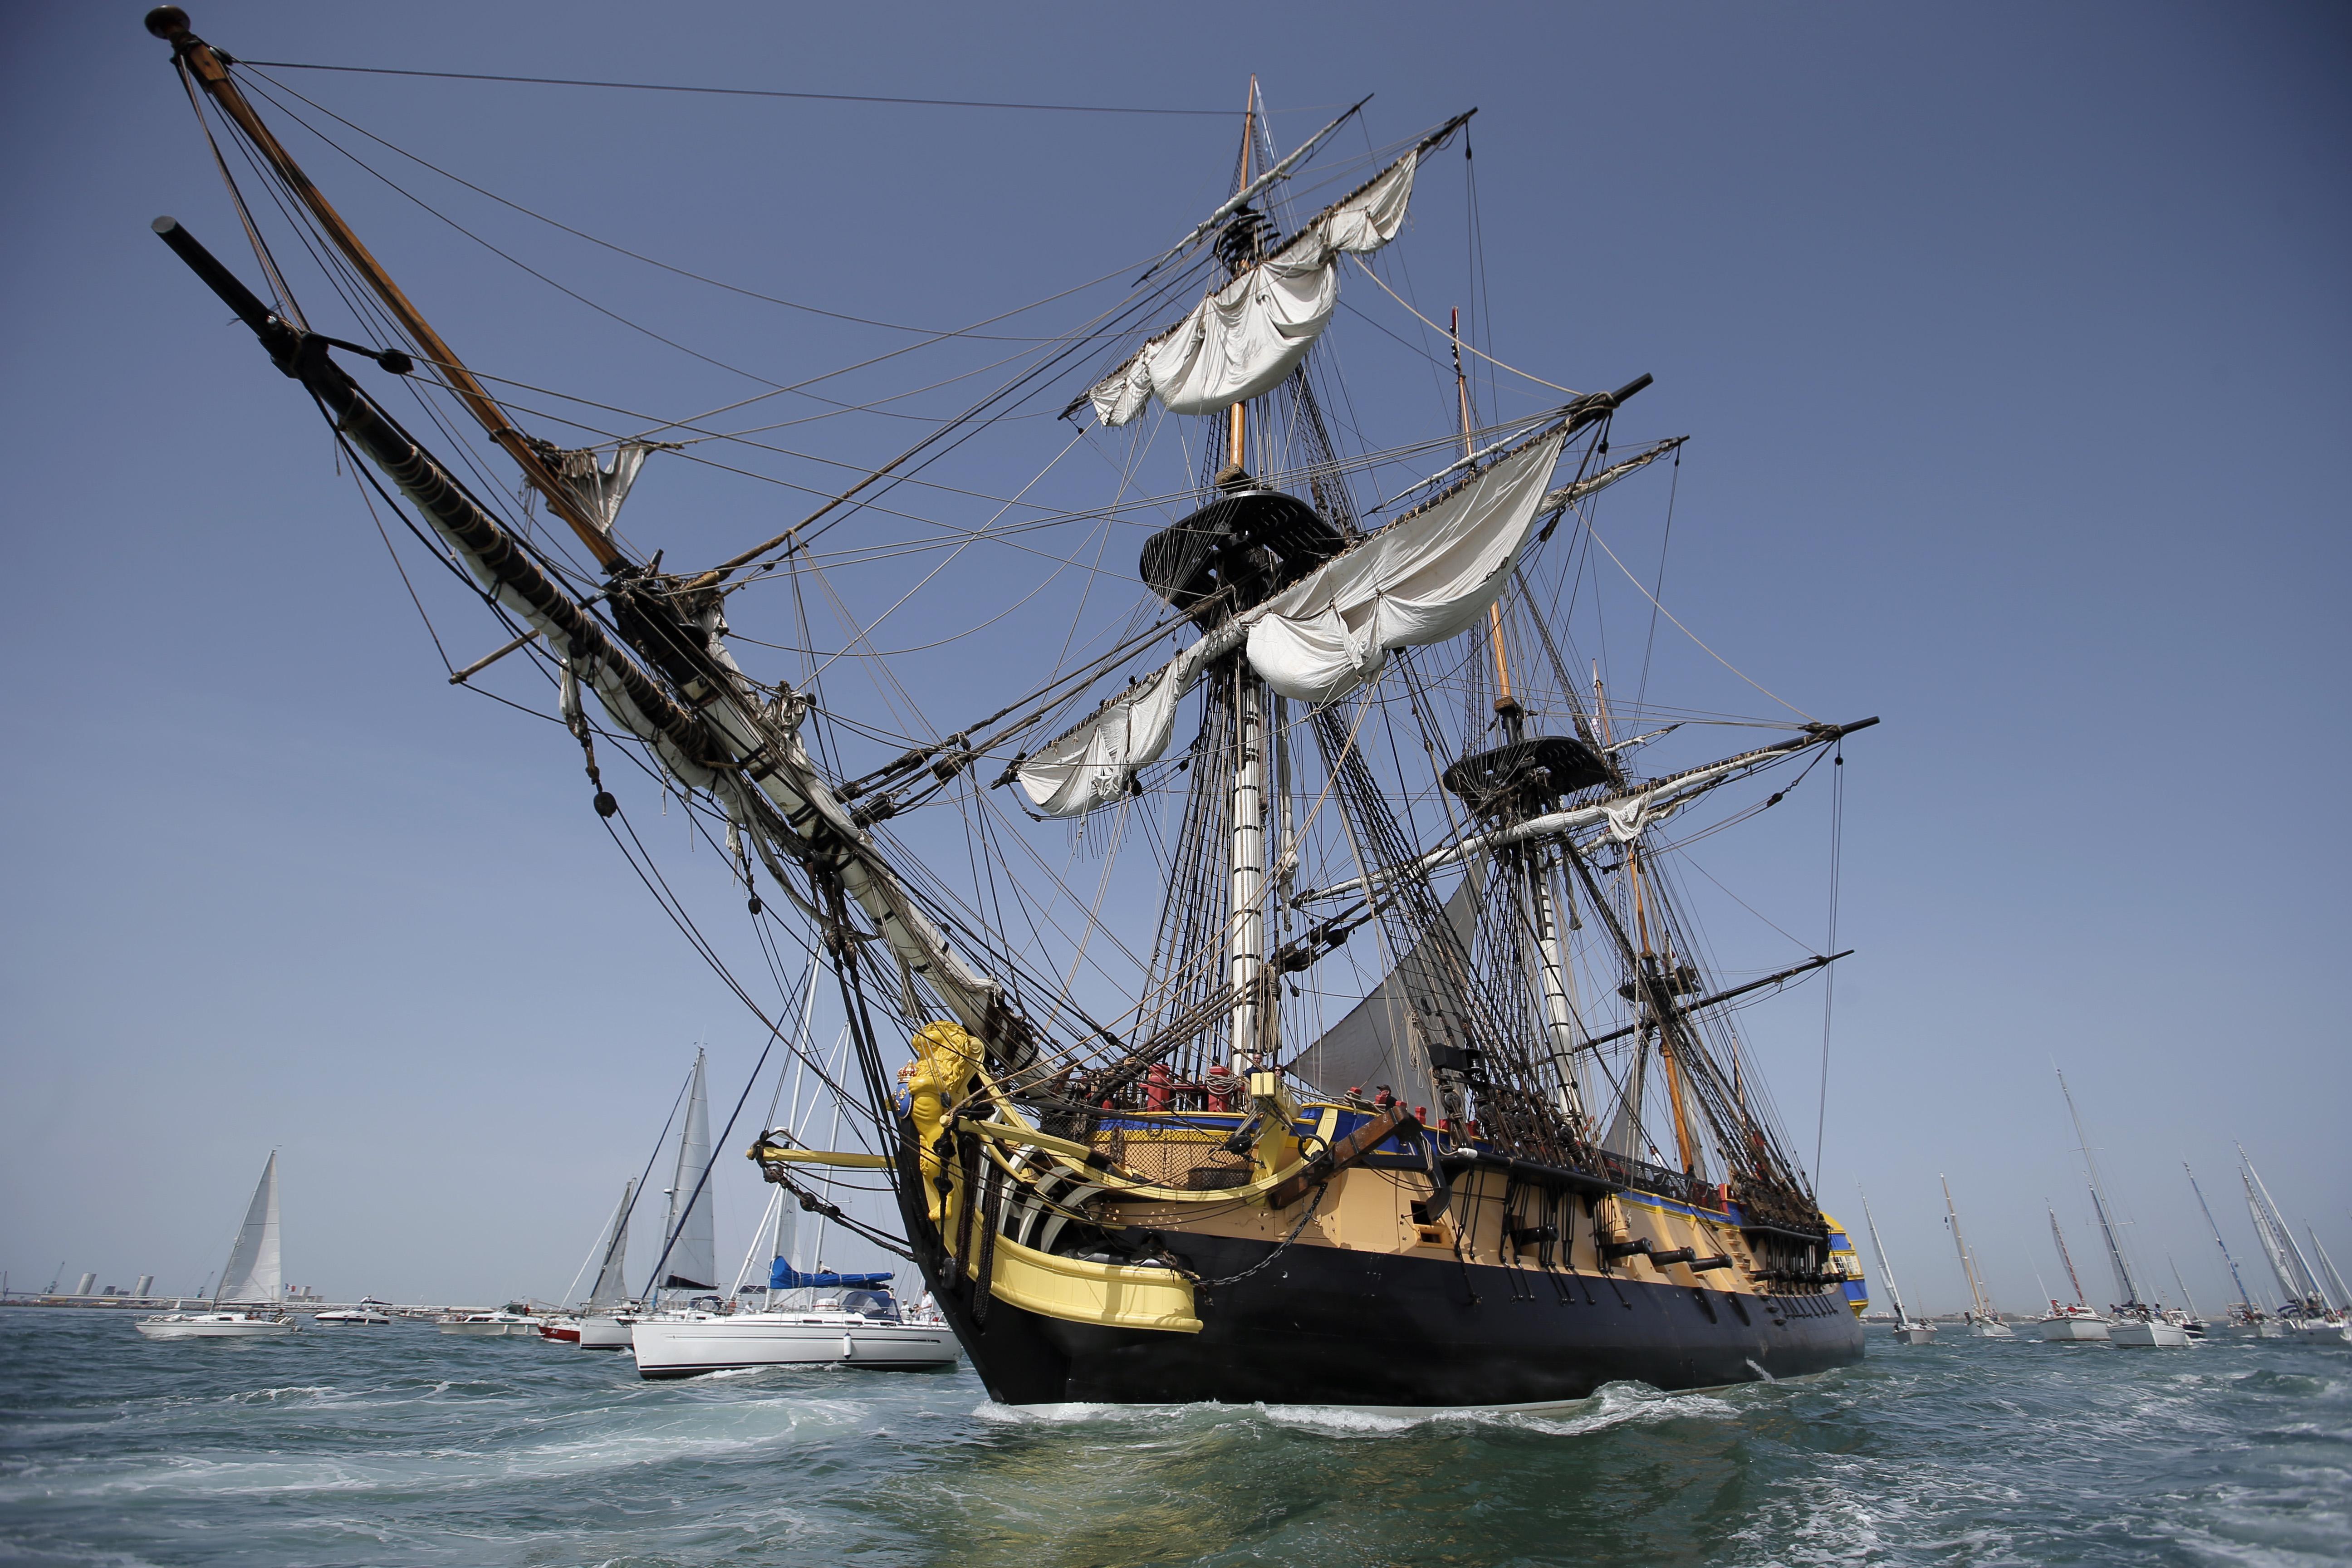 French replica of revolutionary frigate sets sail for Boston.